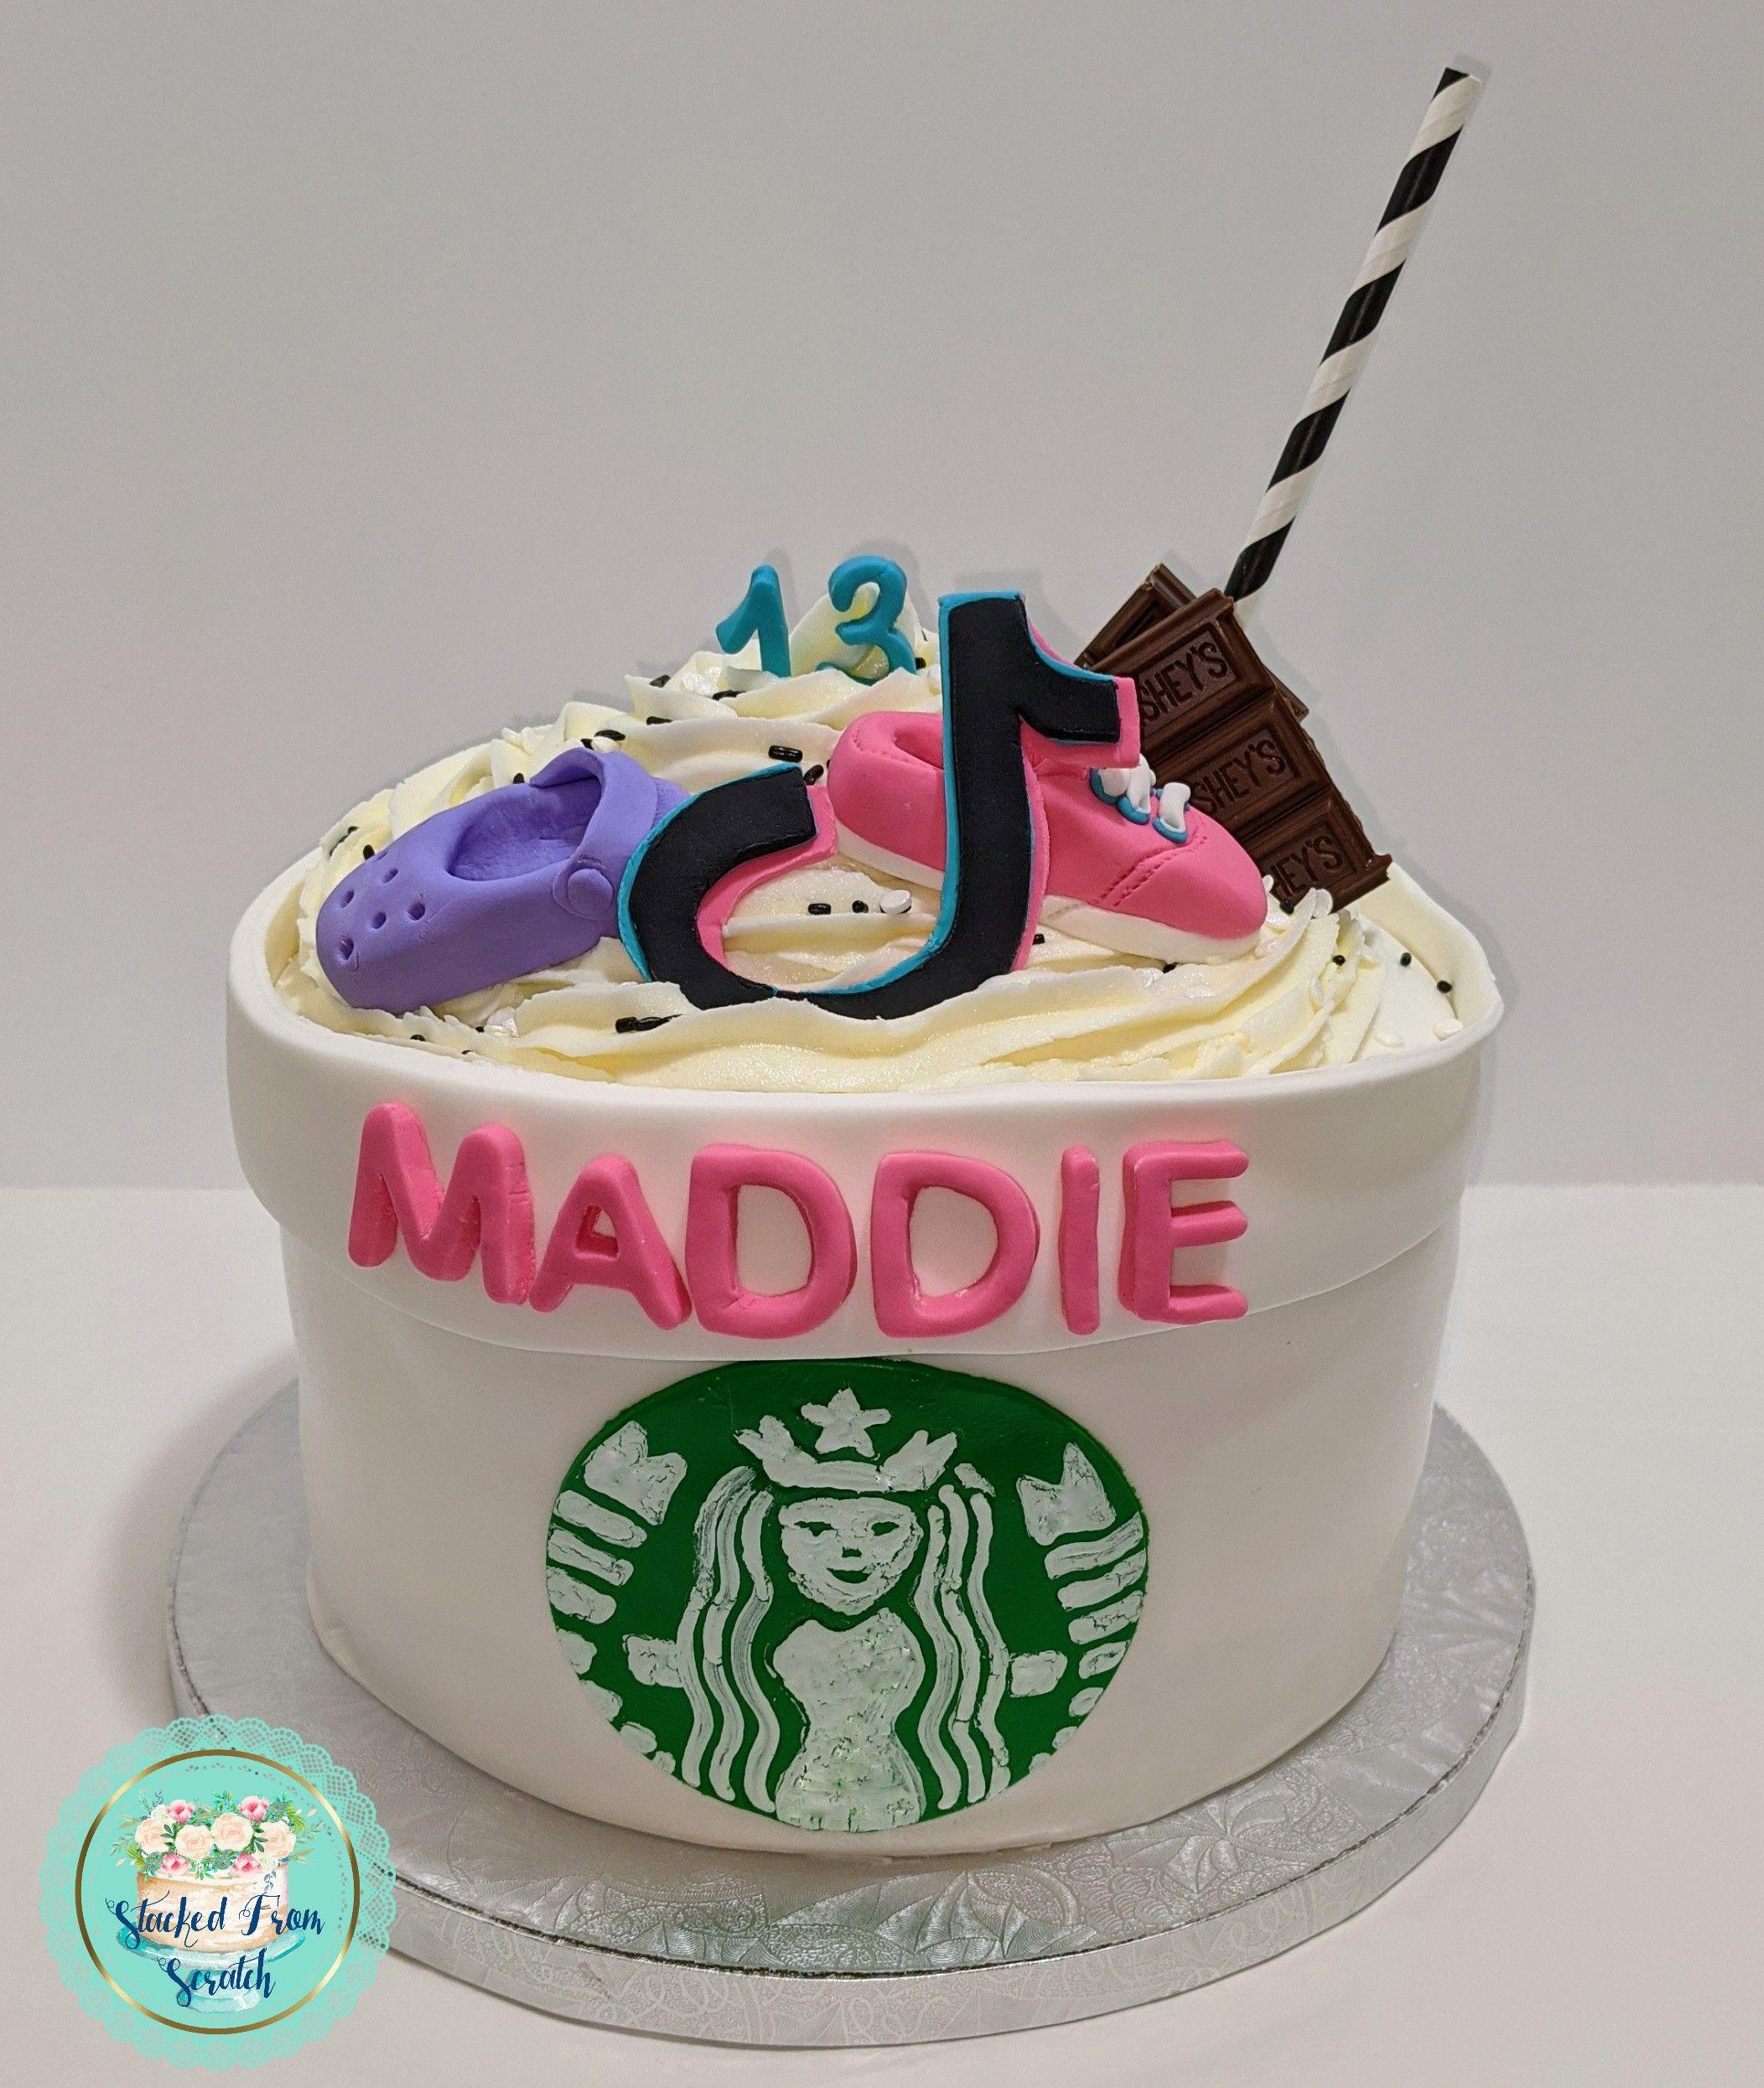 Starbucks Tik Tok Crocs And Vans Birthday Cake Cool Birthday Cakes 6th Birthday Cakes Sweet 16 Cakes